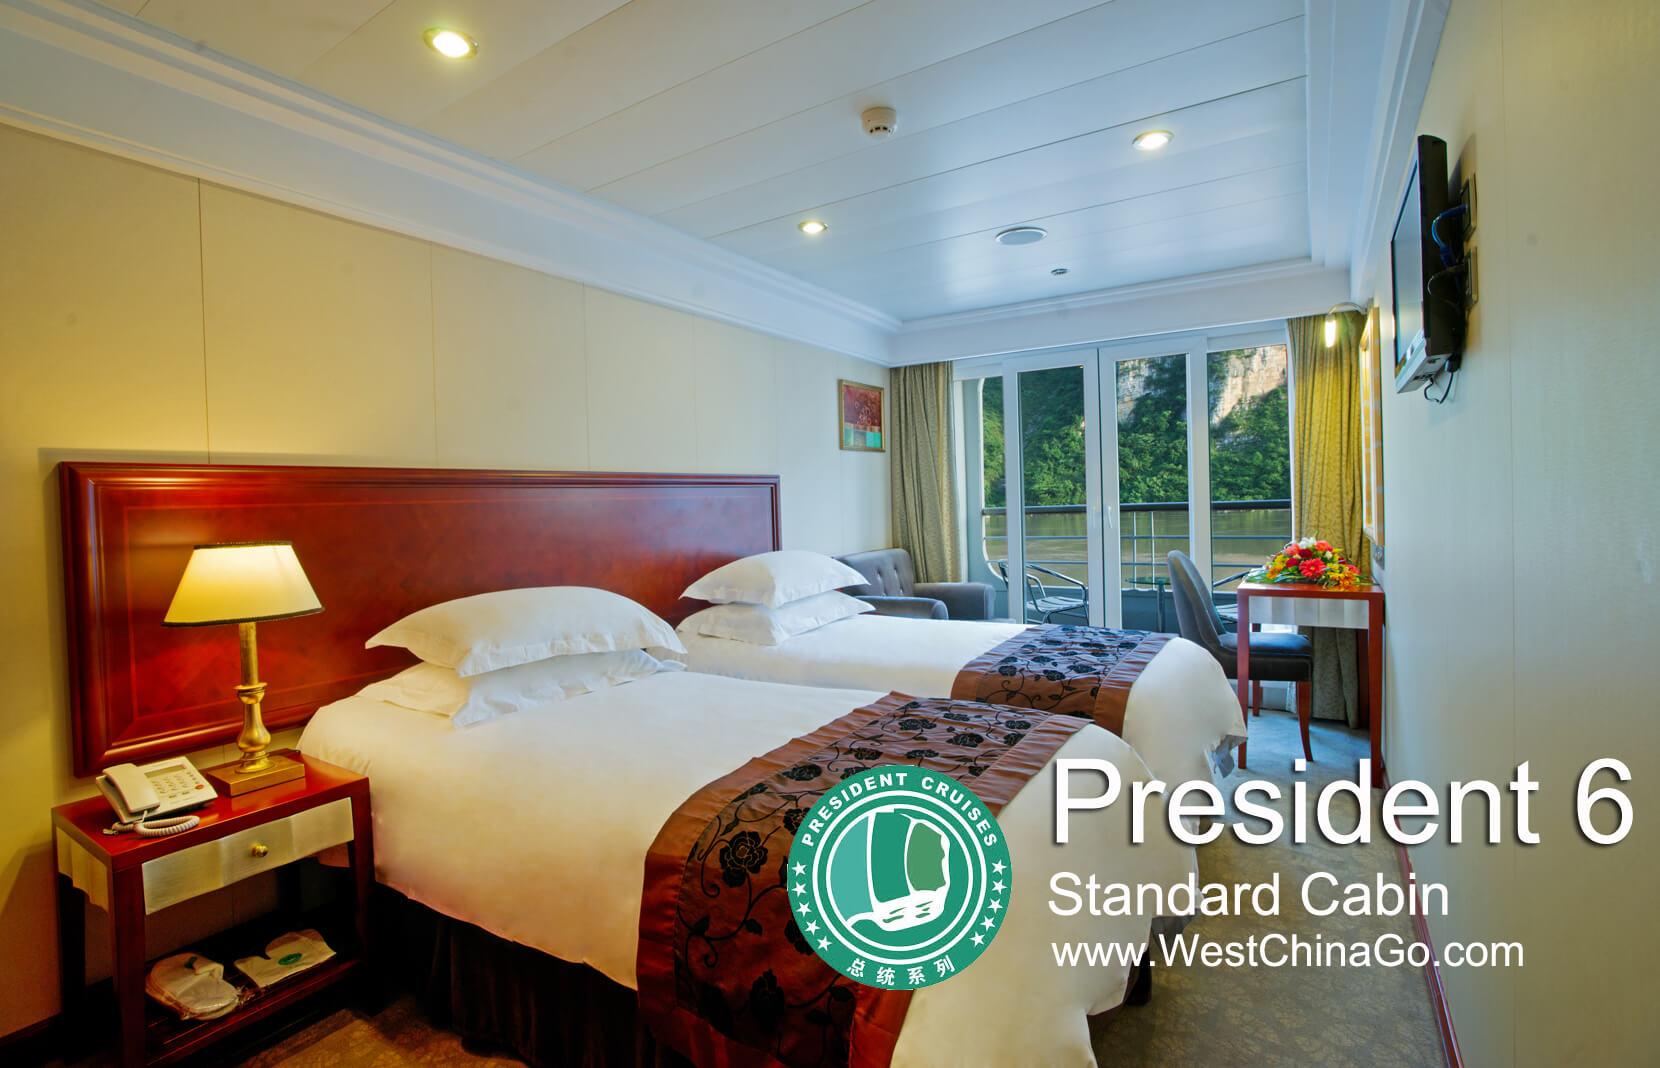 Yangtze River Cruise President 6 standard cabin